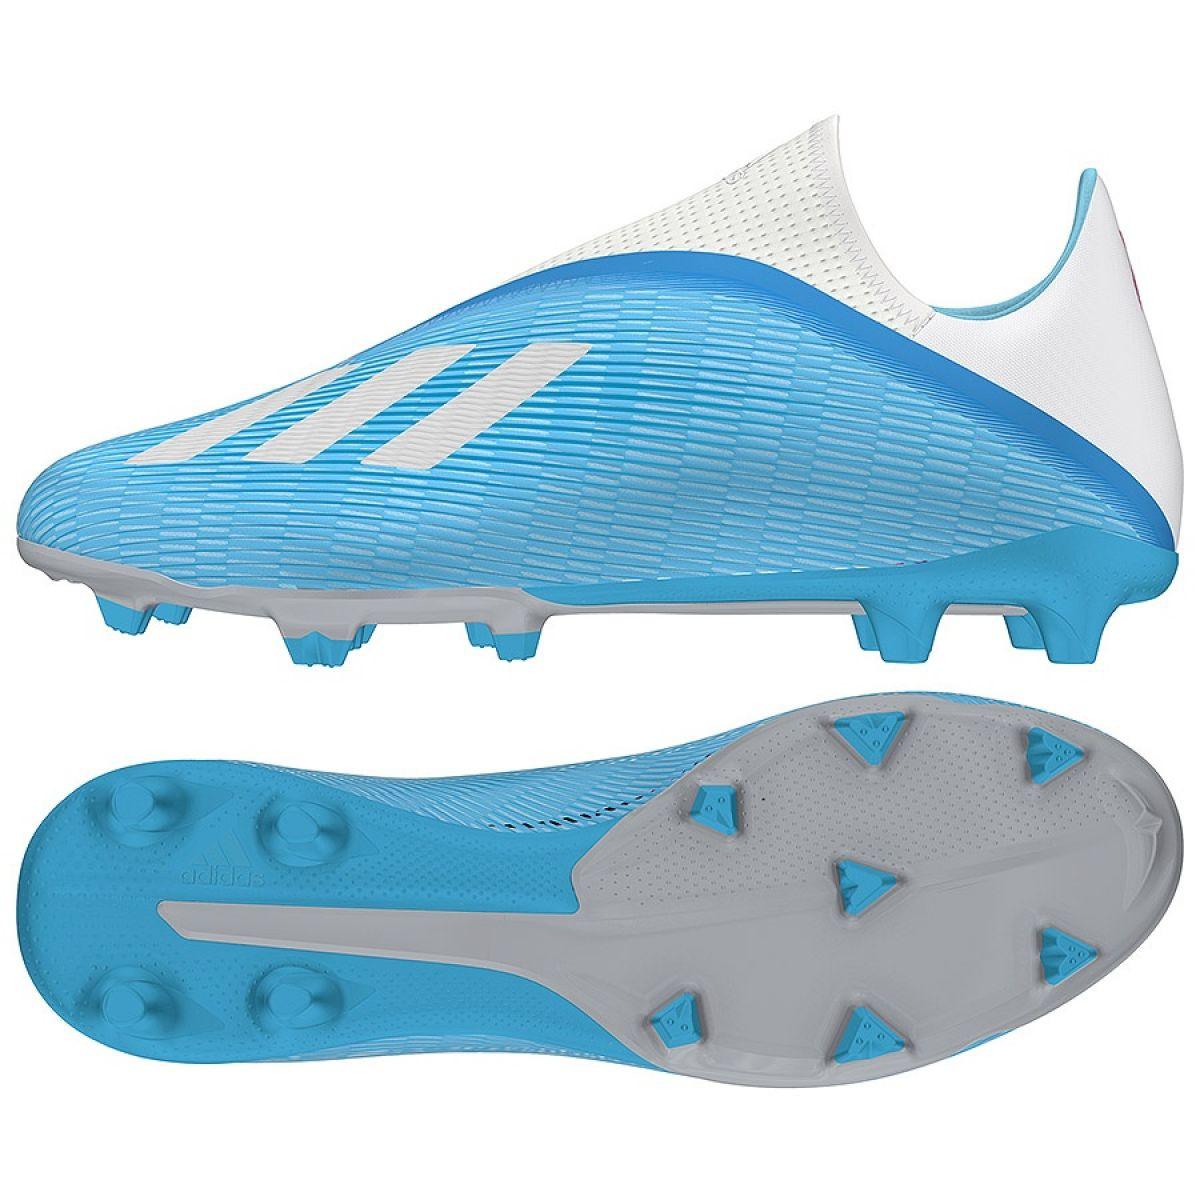 Botas de fútbol adidas X 19.3 Ll Fg M EF0598